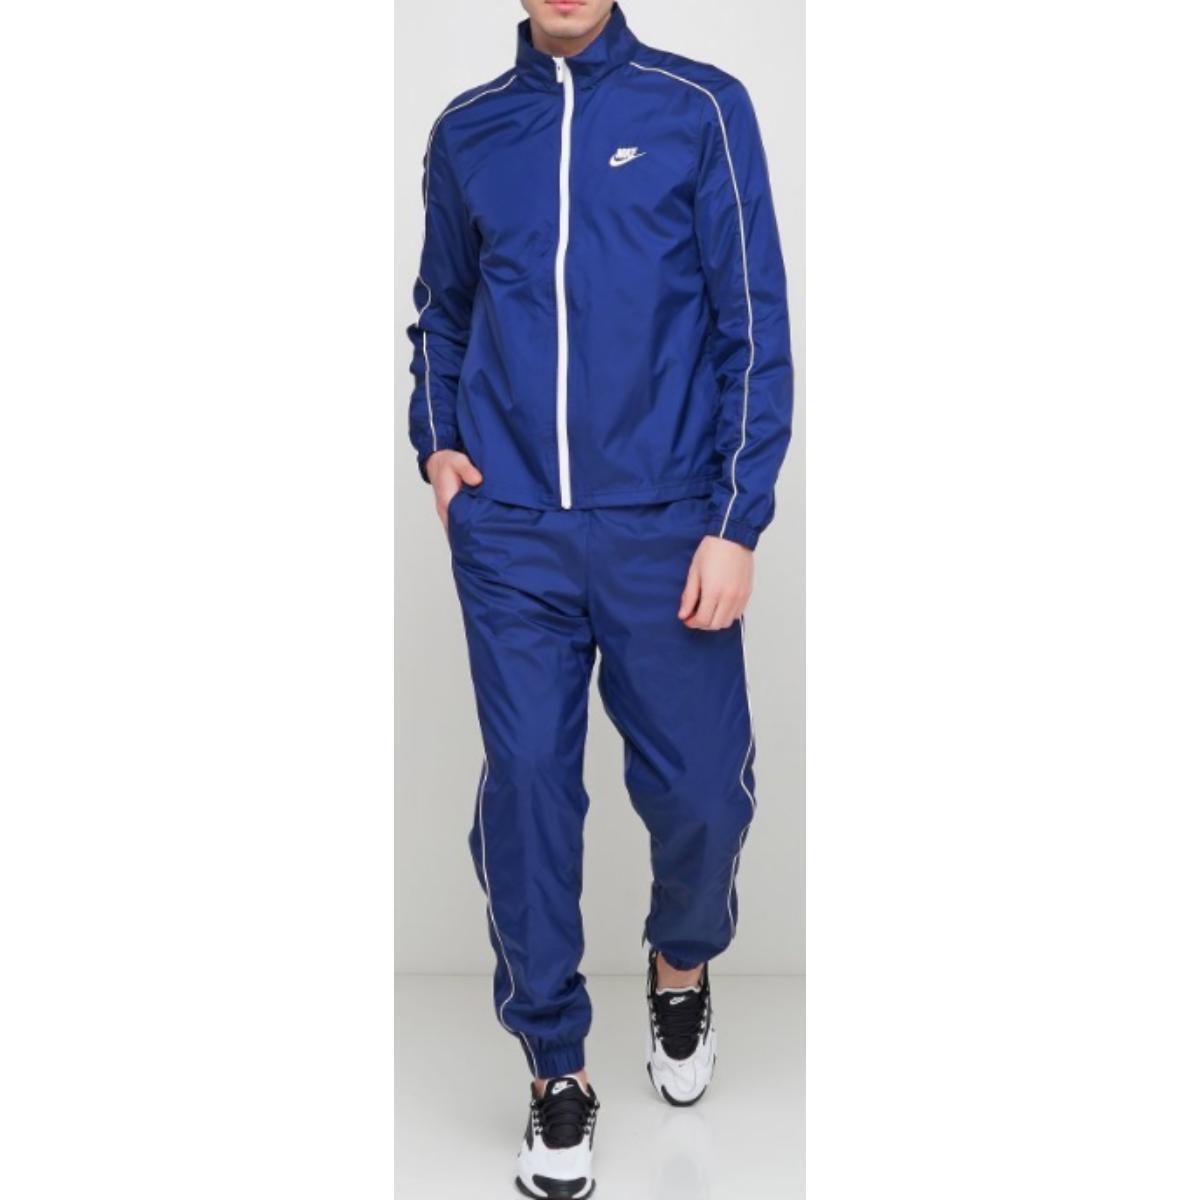 Abrigo Masculino Nike Bv3030-410 Sporswear Marinho